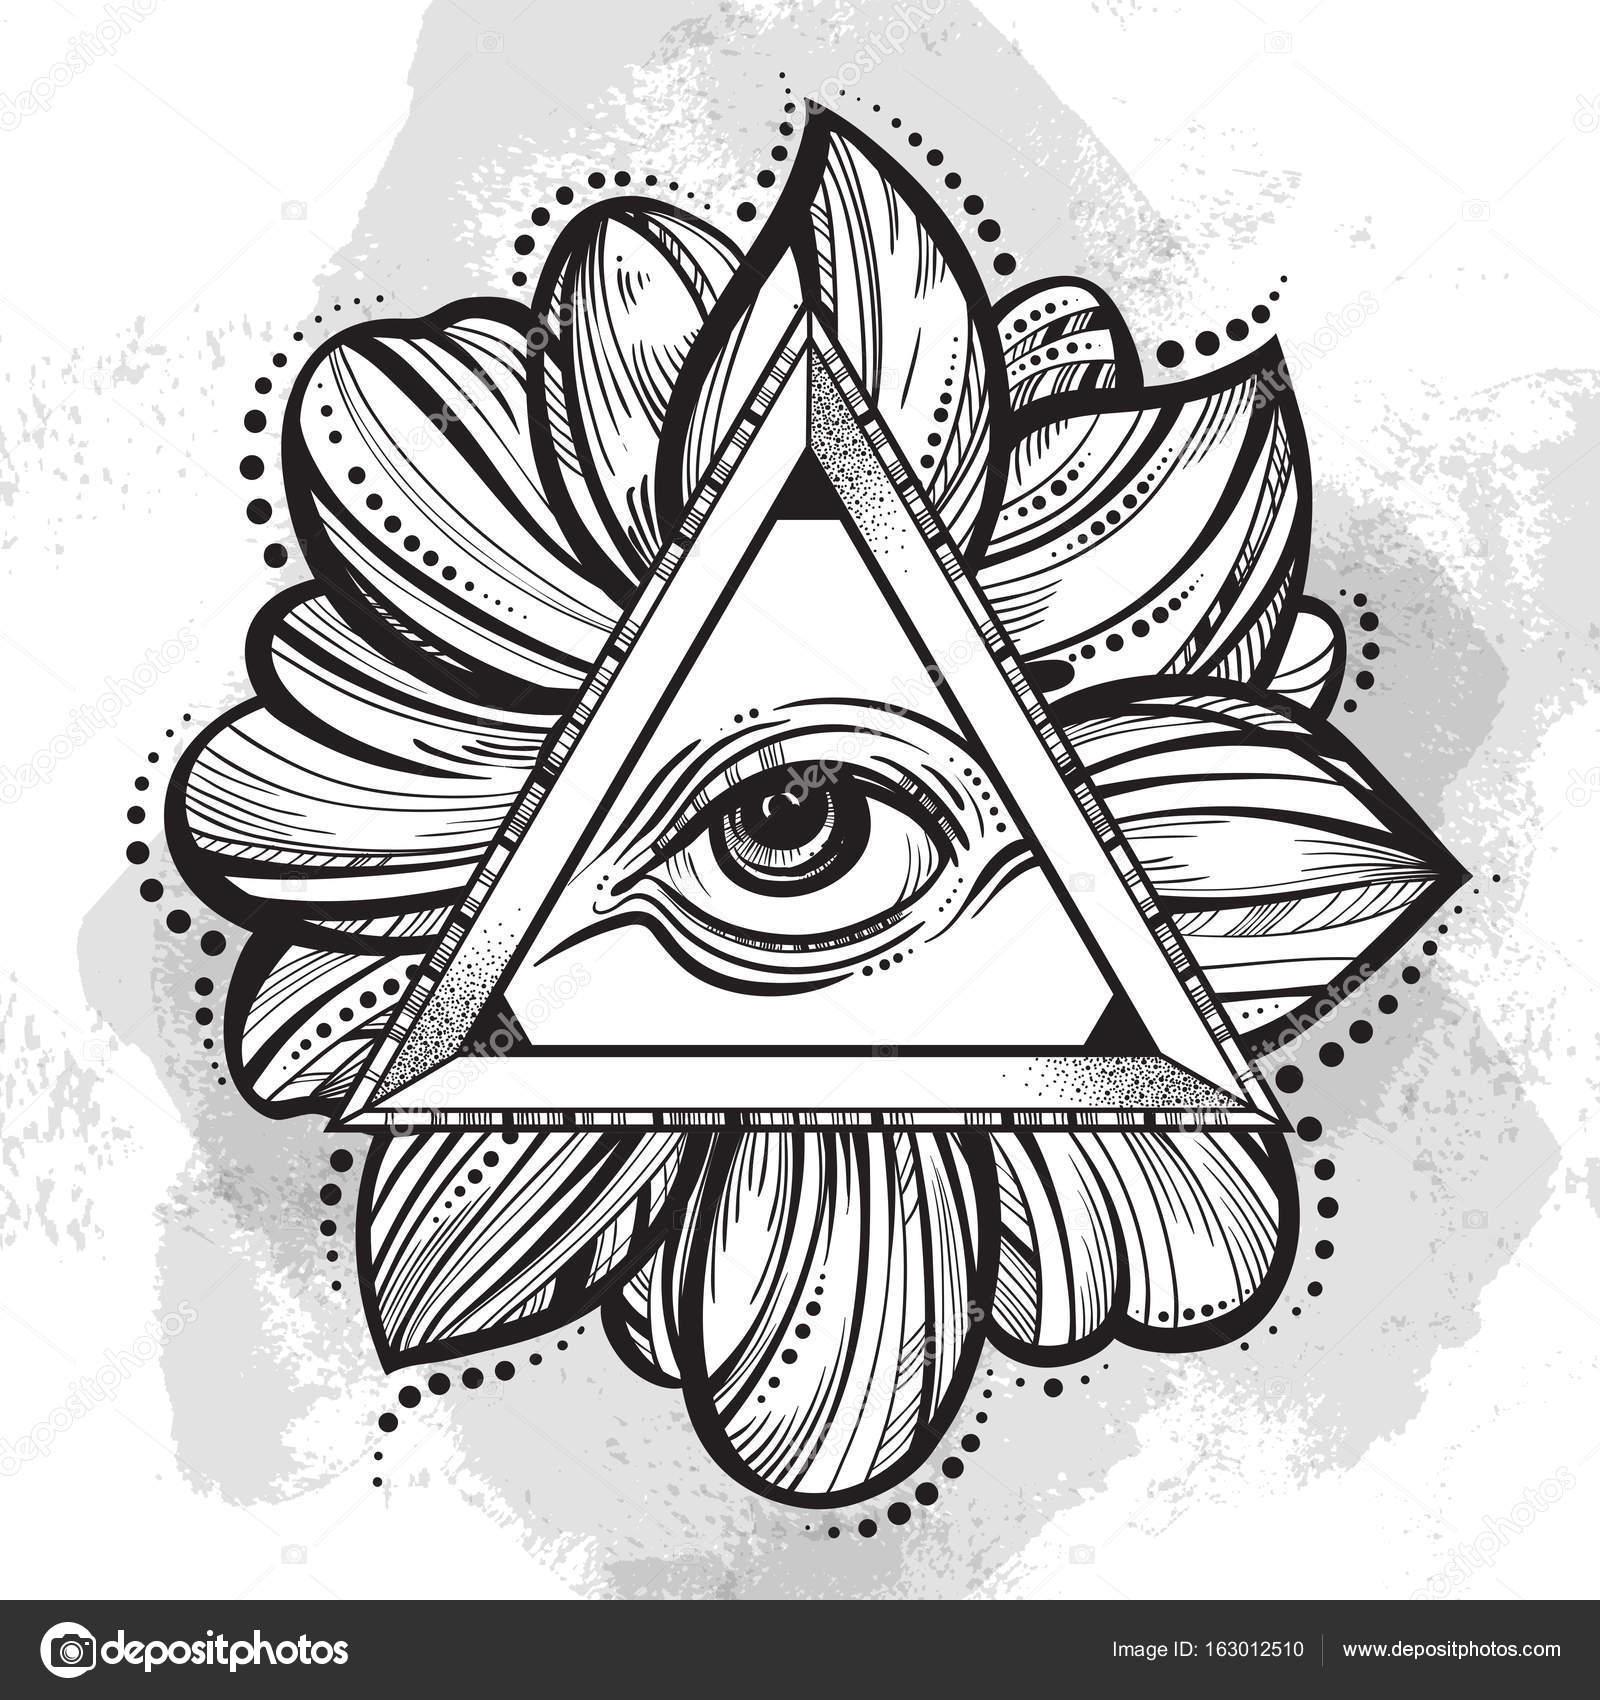 04f07f6f073ad All seeing eye pyramid symbol. Hand-drawn Eye of Providence. Alchemy,  religion, spirituality, tattoo art. Isolated vector illustration. Lotus  flower around.